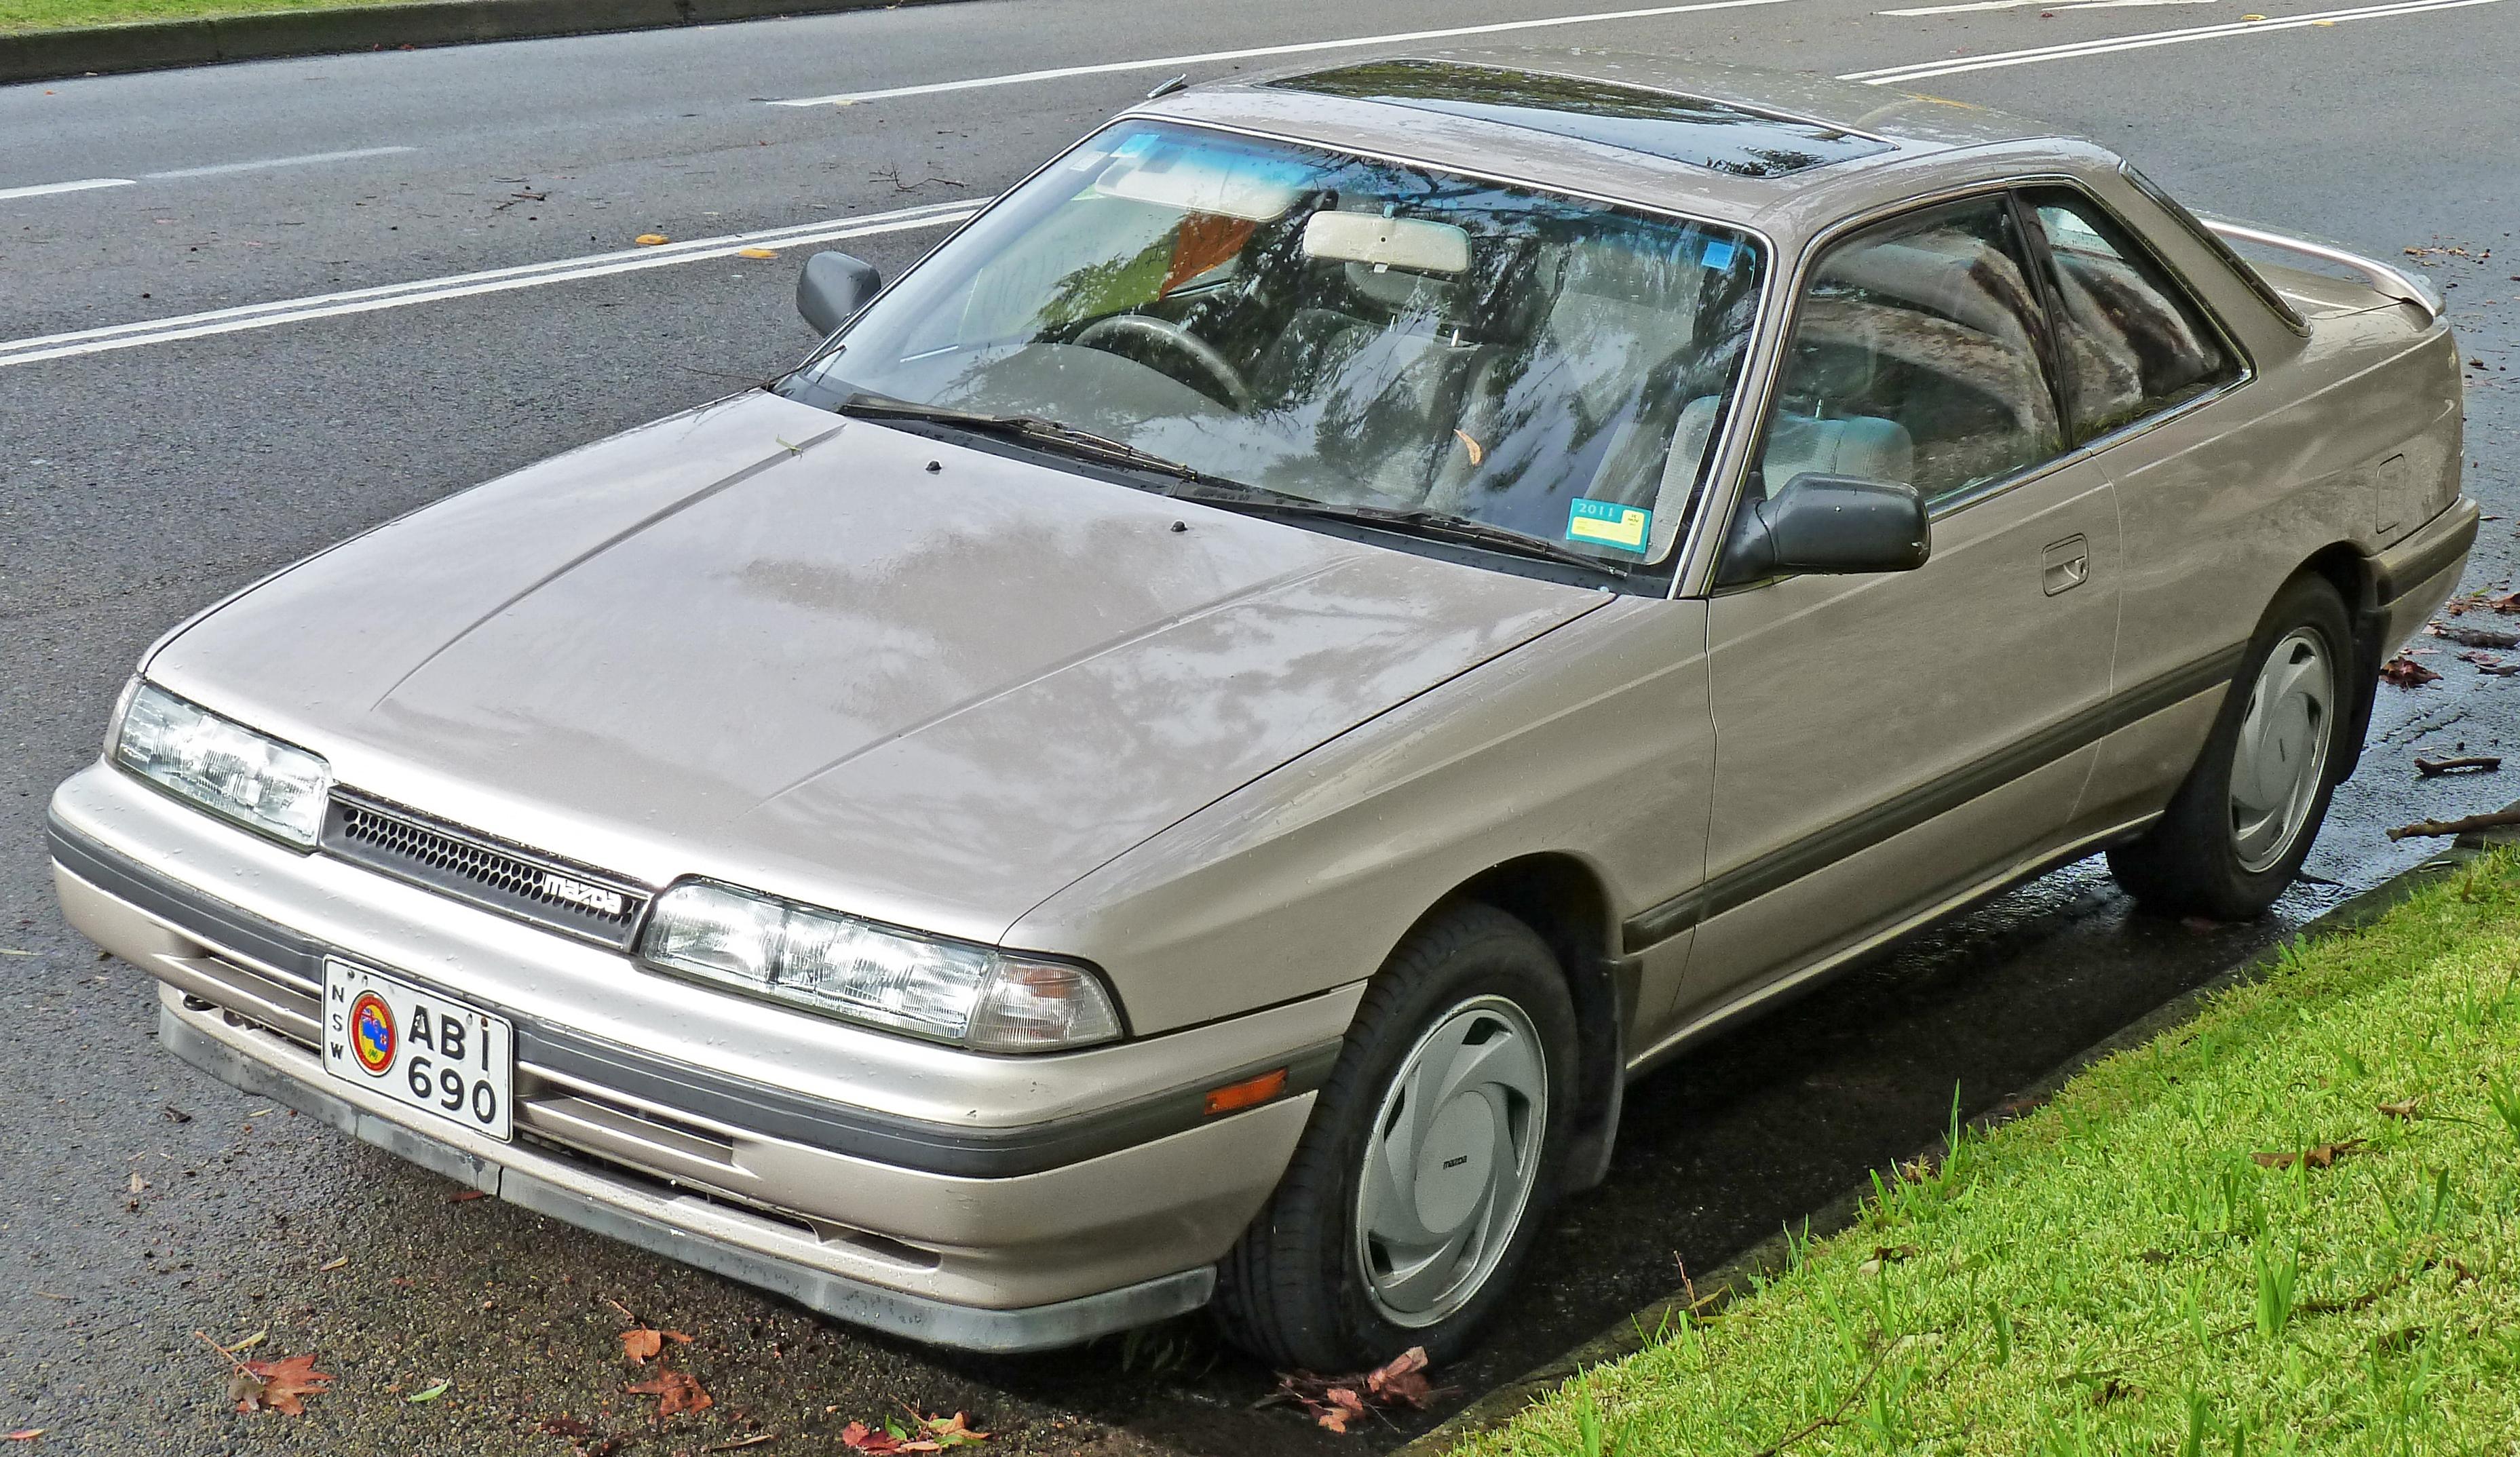 File:1989 Mazda MX-6 (GD Series 2) coupe (2011-06-15).jpg ...